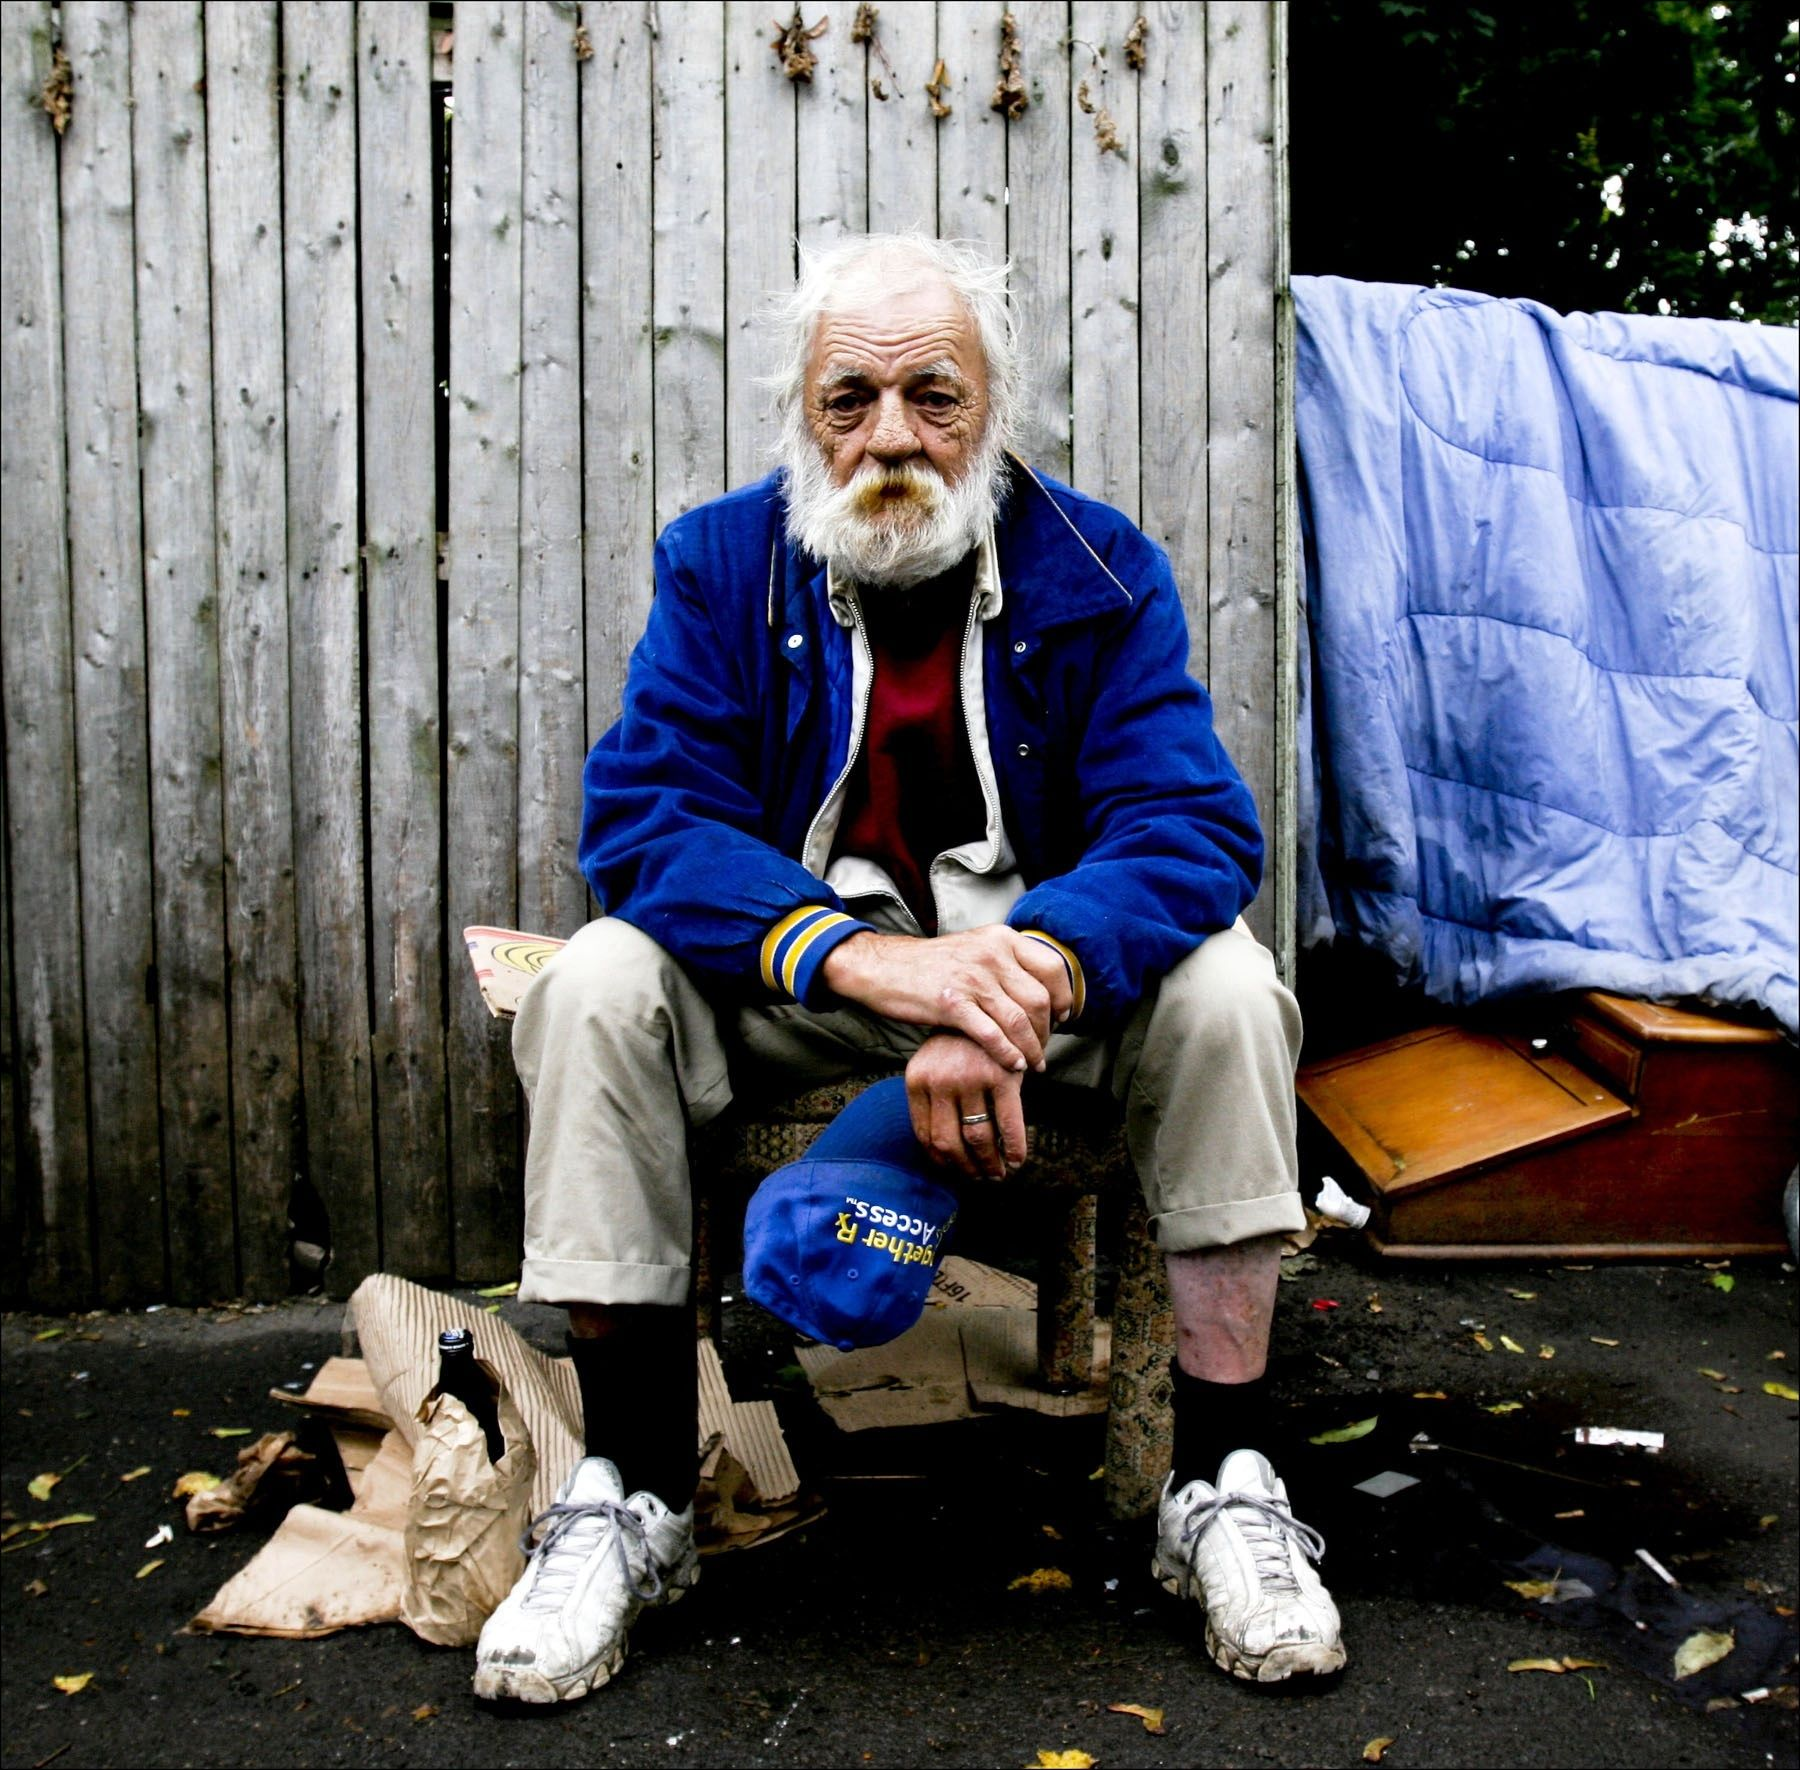 Homeless Homeless Person Homeless Help Homeless People